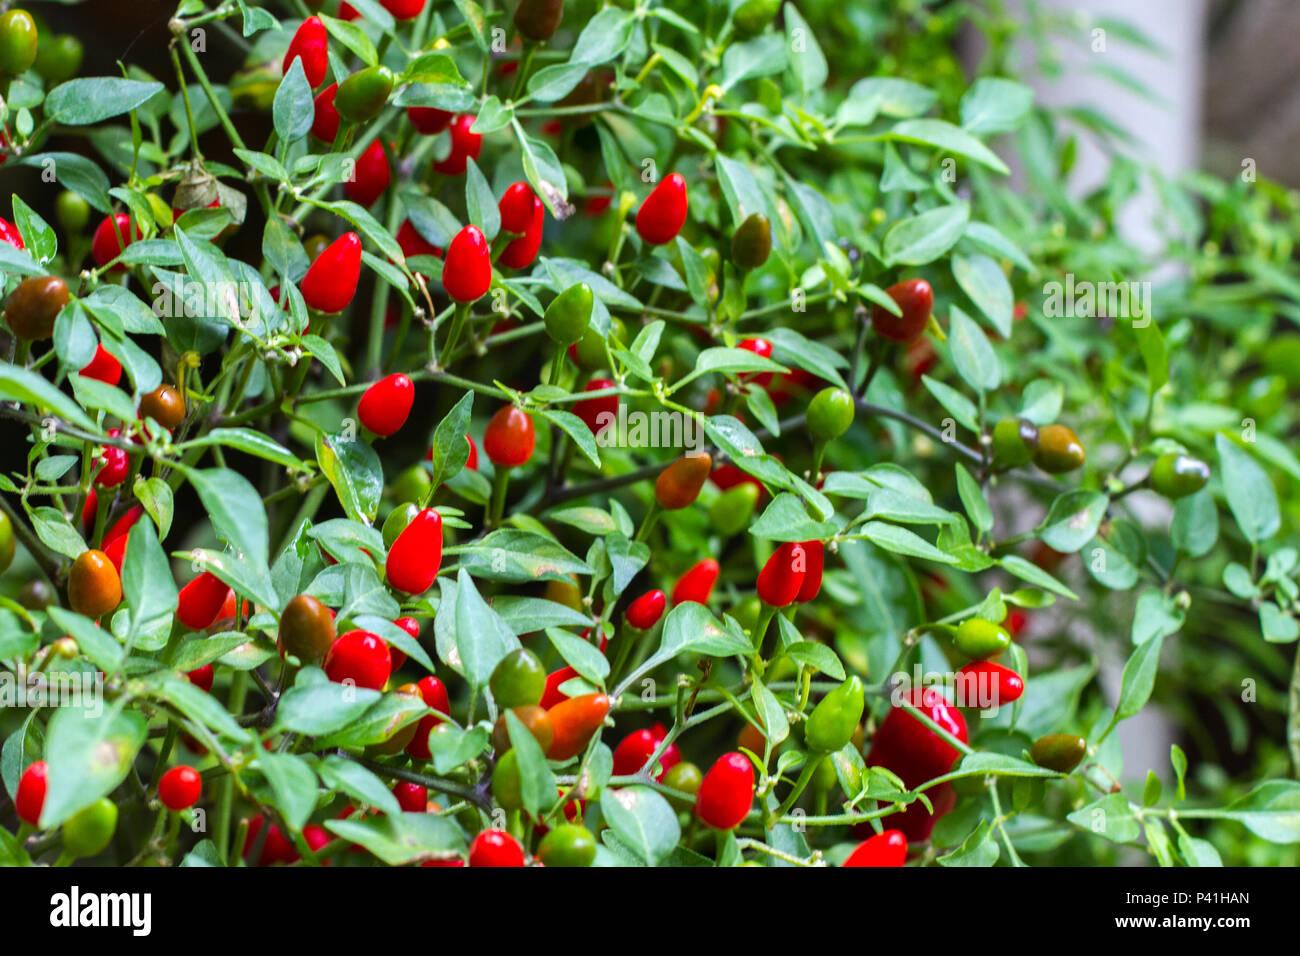 Pimenta Pimenta Cumari Pimenta vermelha Pimenta no Pé arbusto de pimentas tempero condimento condimento culinário picante gastronomia alimentos pratos picantes Immagini Stock